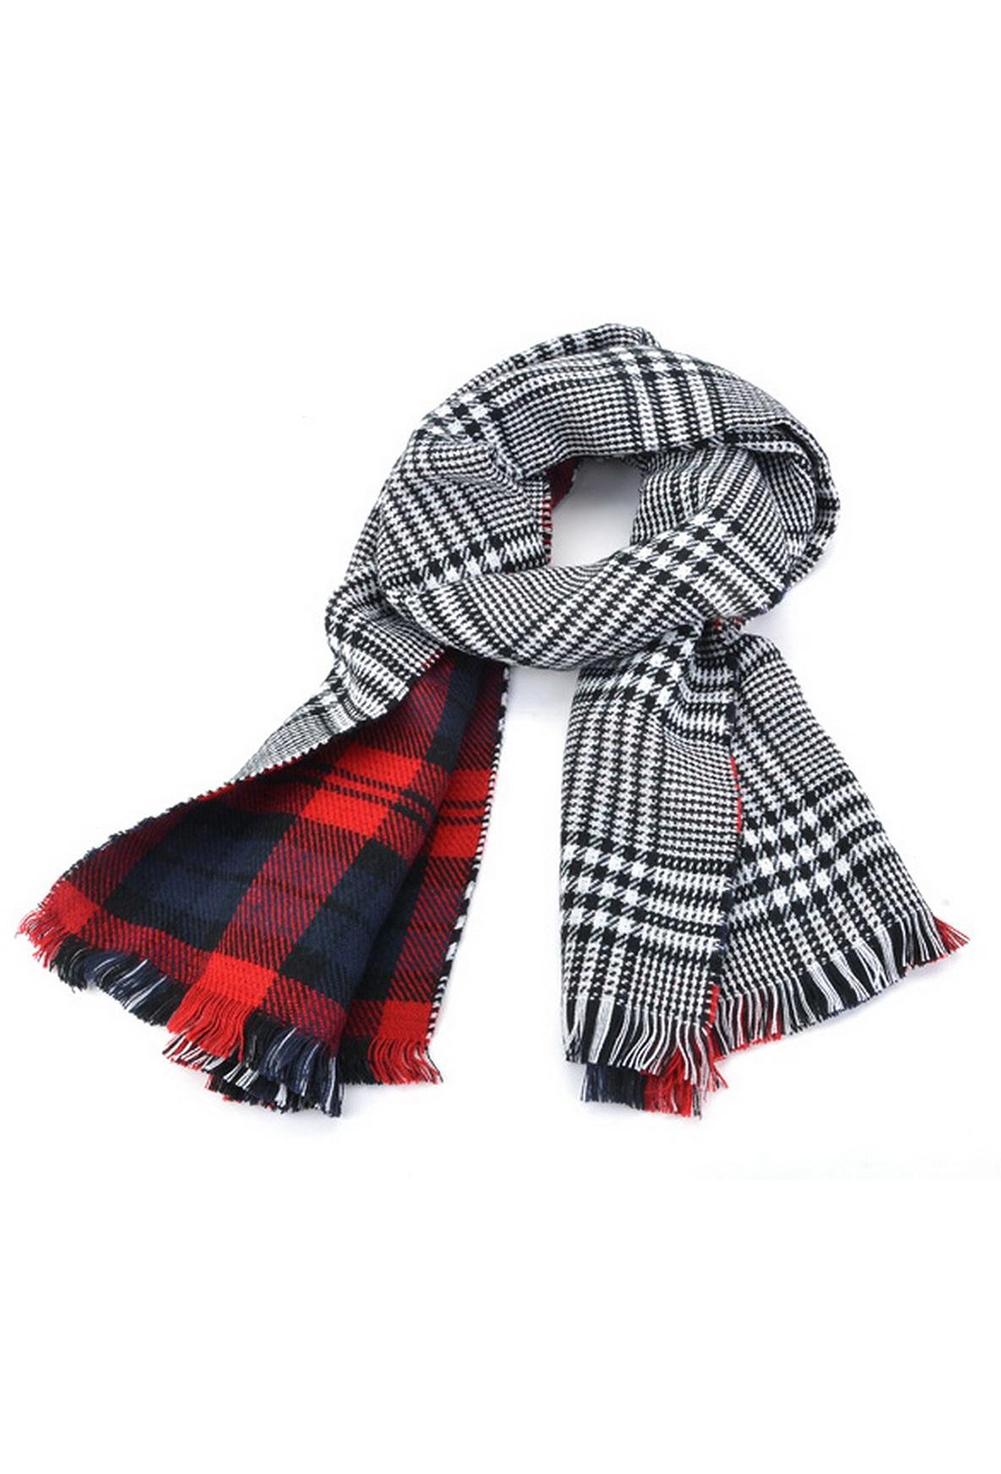 31031308ecbaa Details about Lady Women's Long Check Plaid Tartan Scarf Wraps Shawl Stole  Warm Scarves Red PK